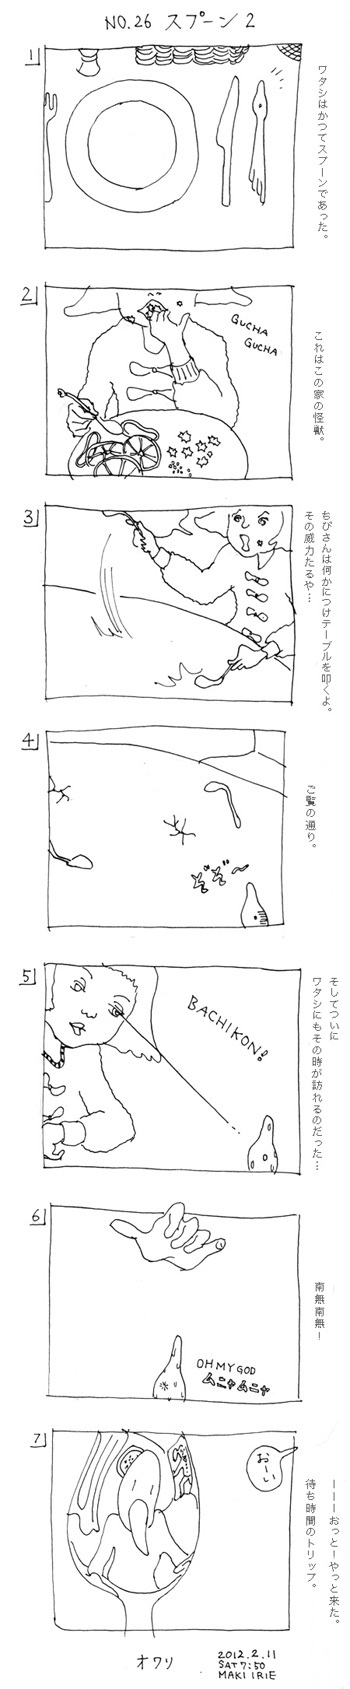 manga_26spoon2.1689.jpg